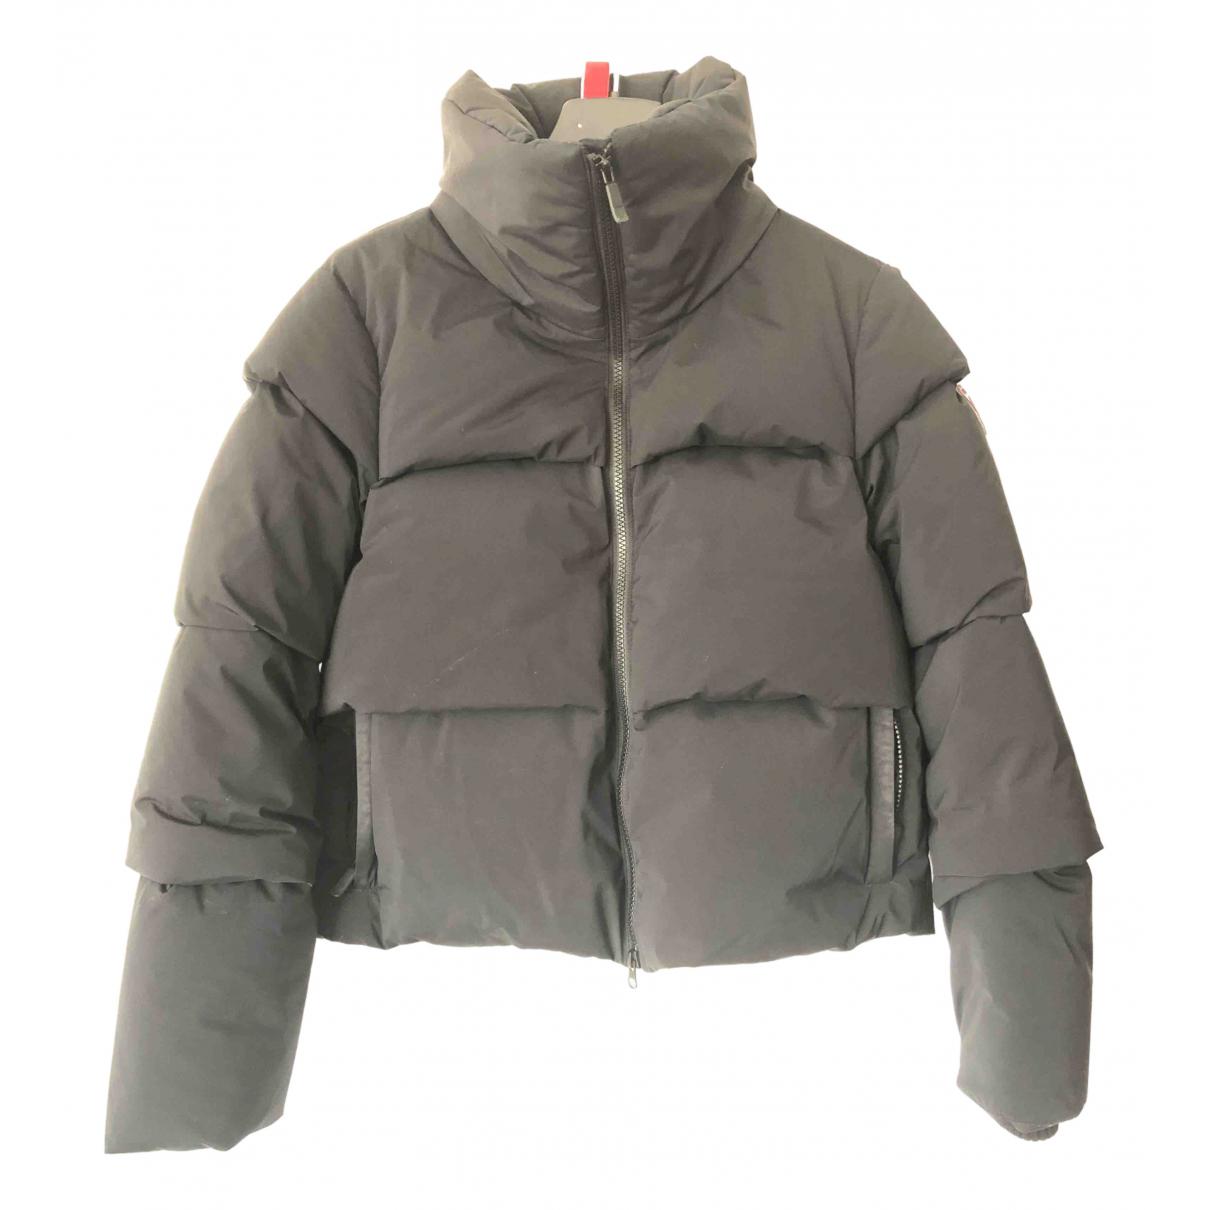 Rossignol \N Black jacket for Women S International